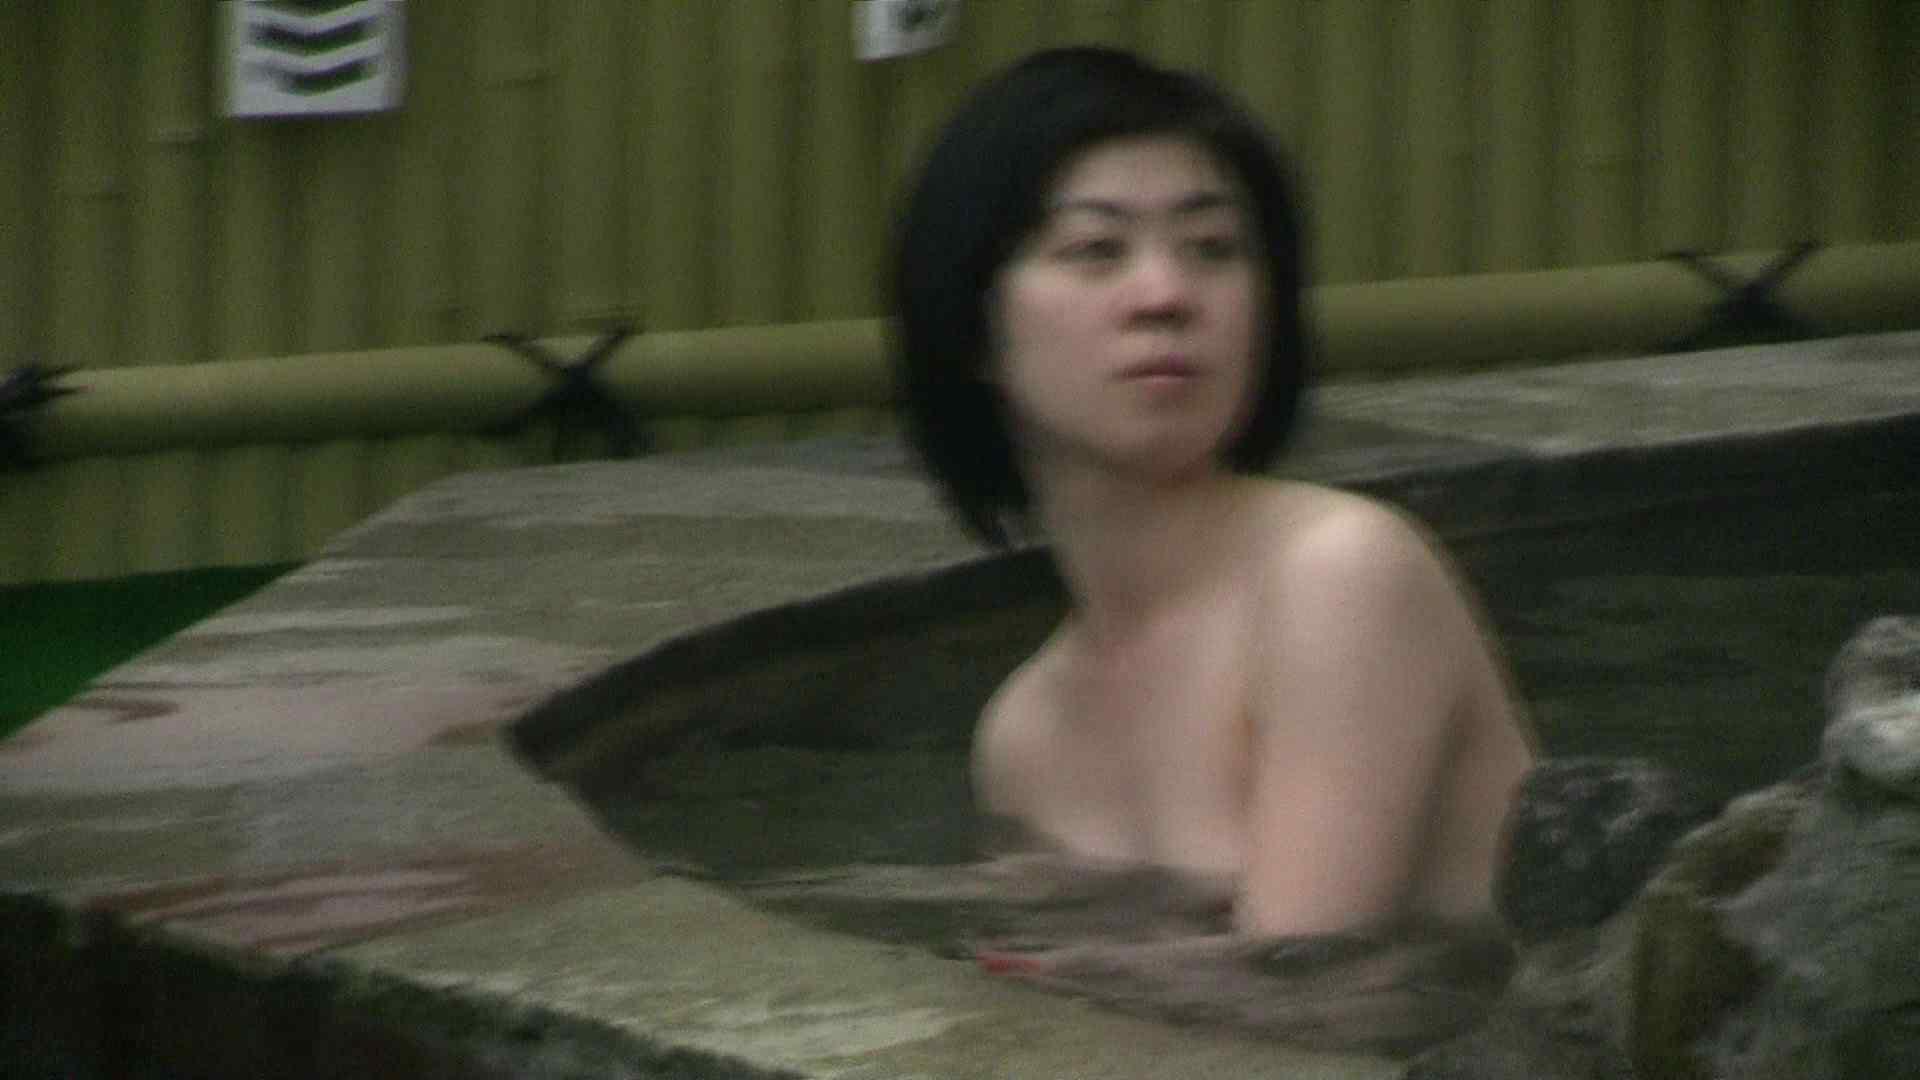 Aquaな露天風呂Vol.685 露天風呂突入 | 盗撮師作品  88pic 4